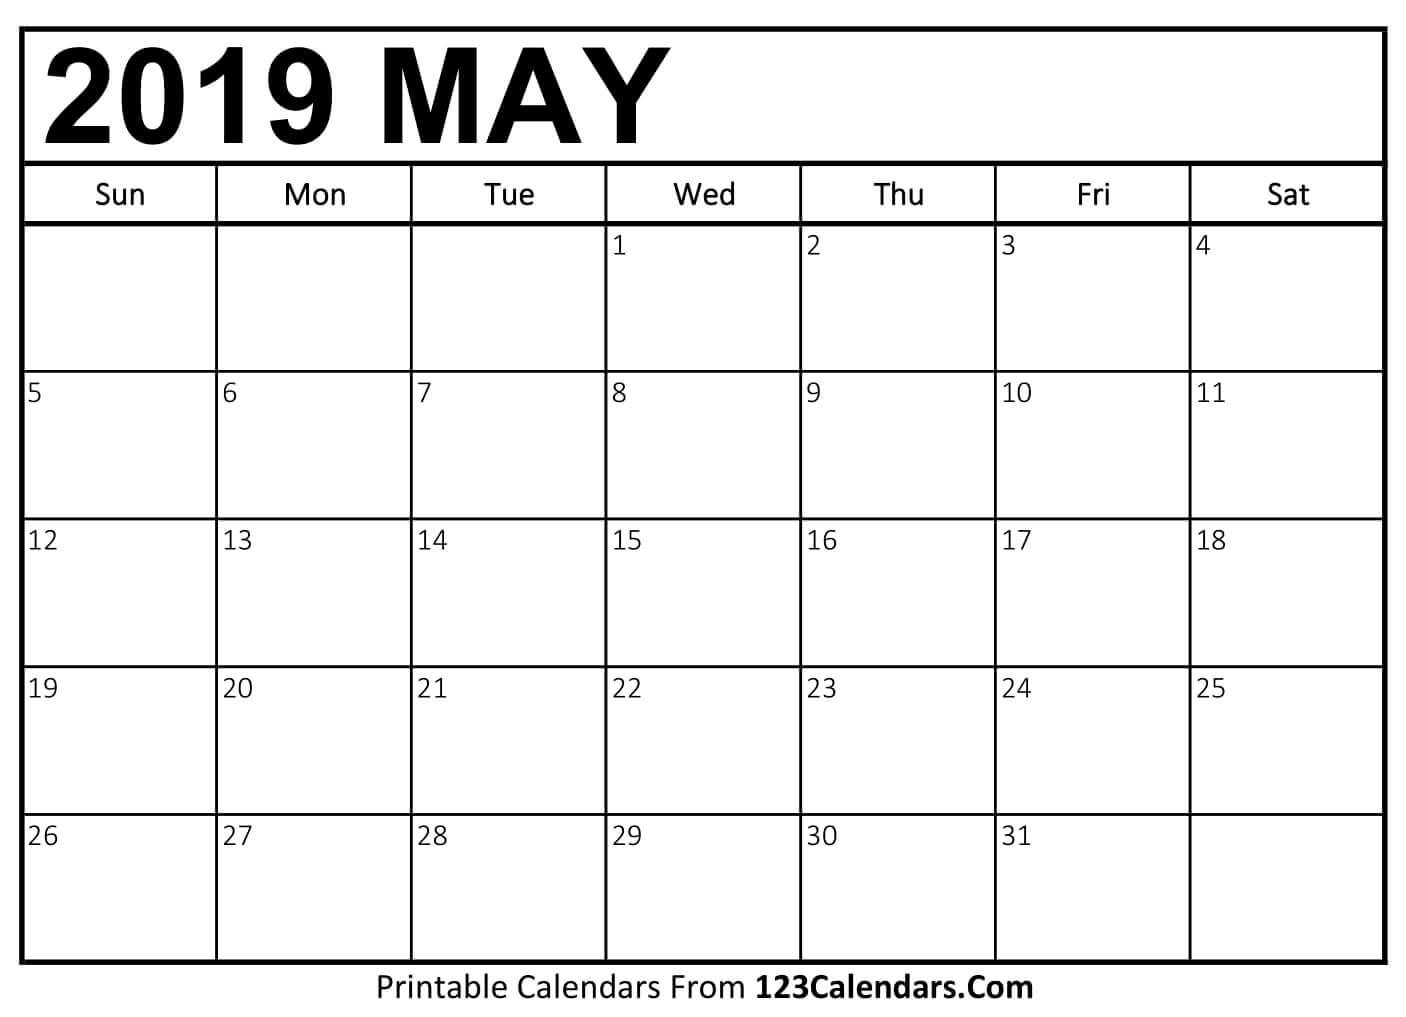 Printable May 2019 Calendar Templates – 123Calendars Calendar Of 2019 May